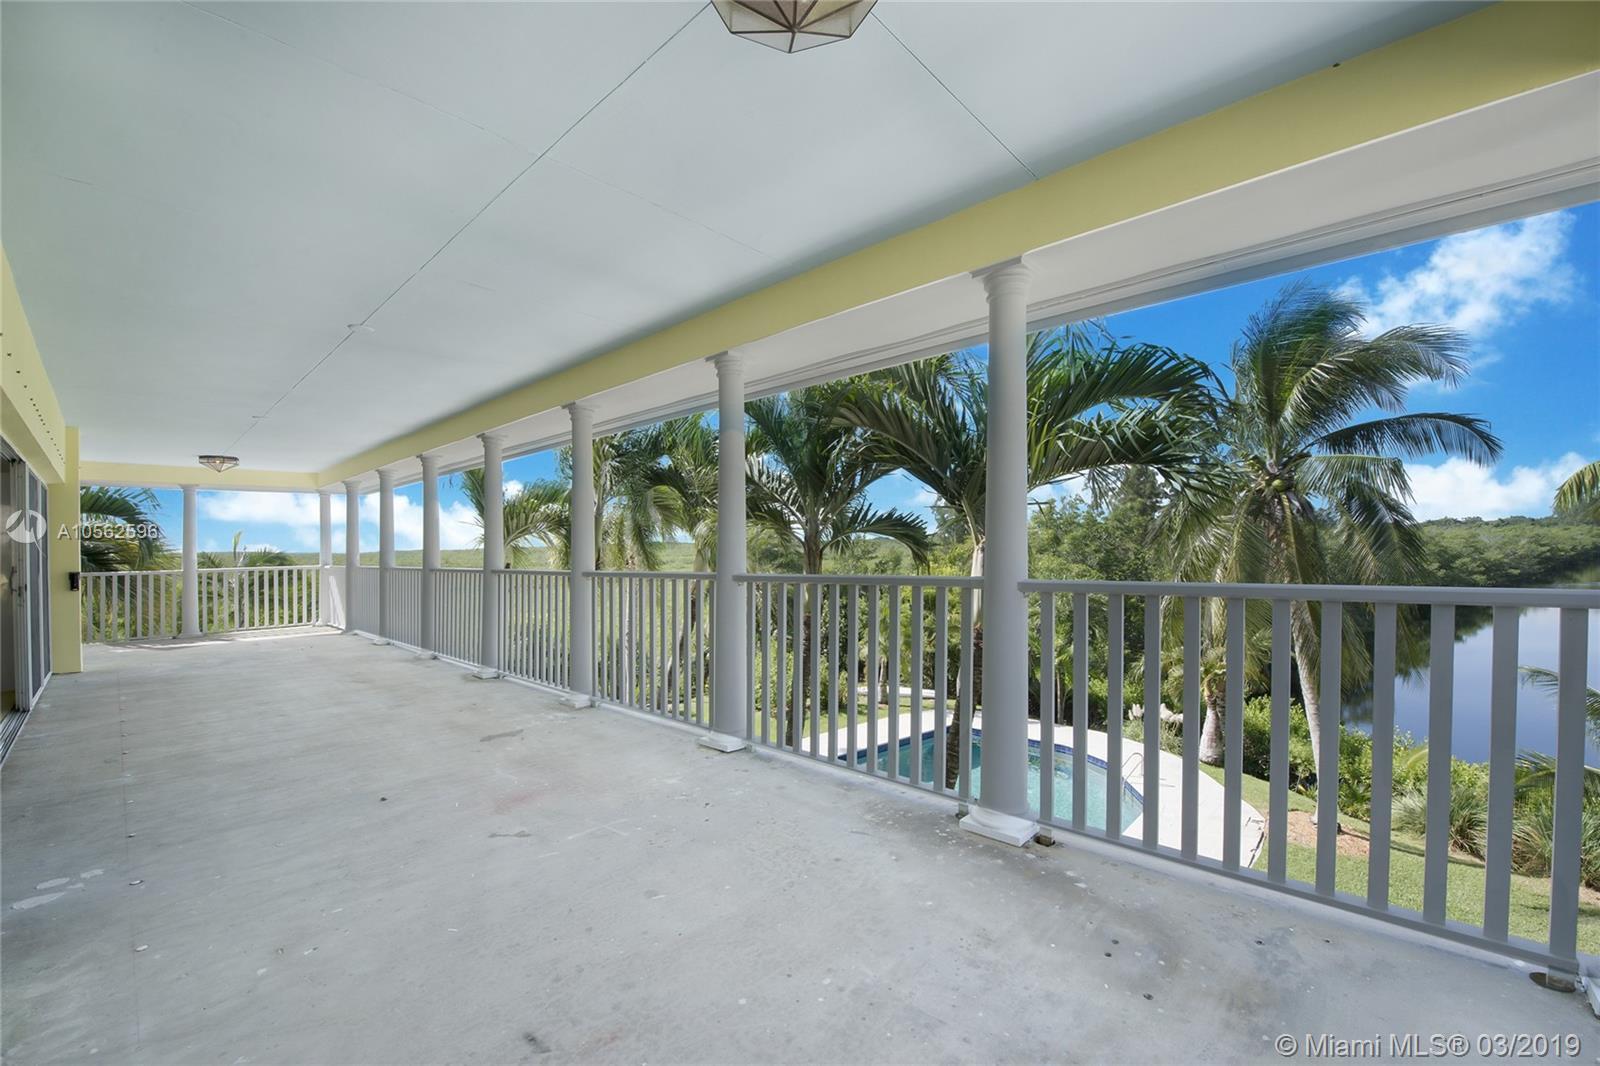 11098 Marin St, Kendall, Florida